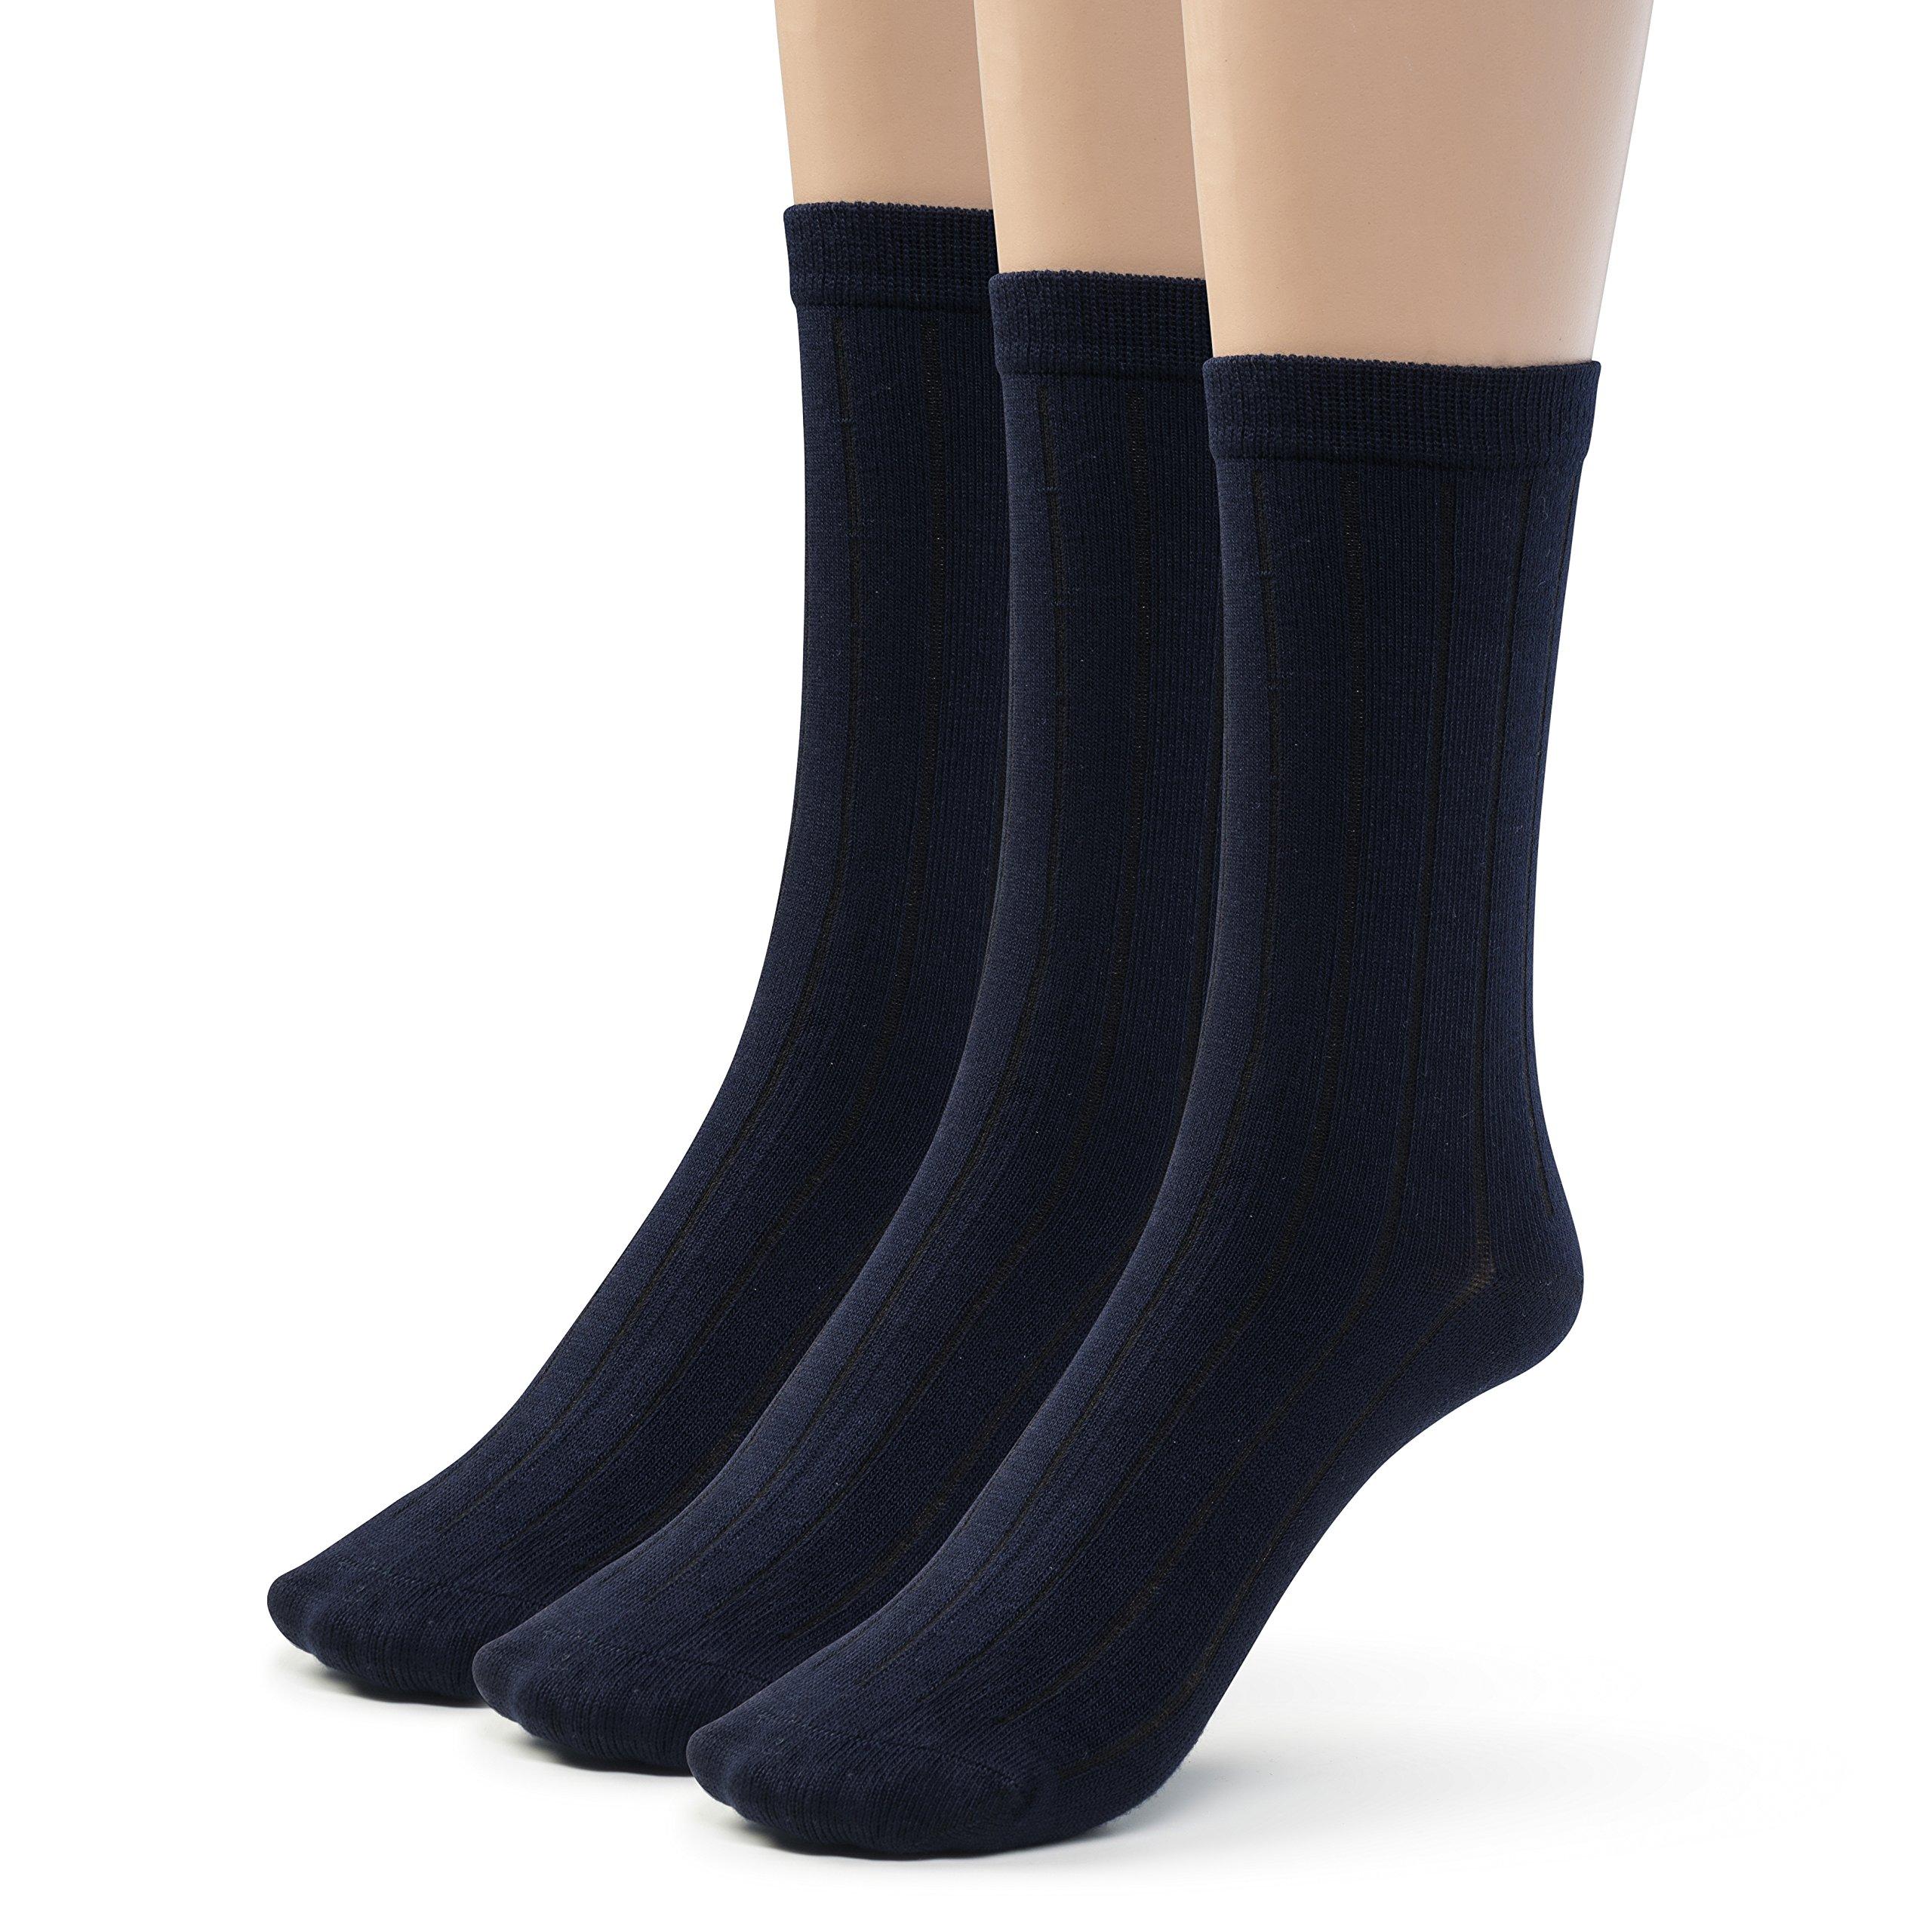 Silky Toes Bamboo Cotton Ribbed Crew Boys School Uniform Socks (Small (7-8), Dark Navy)